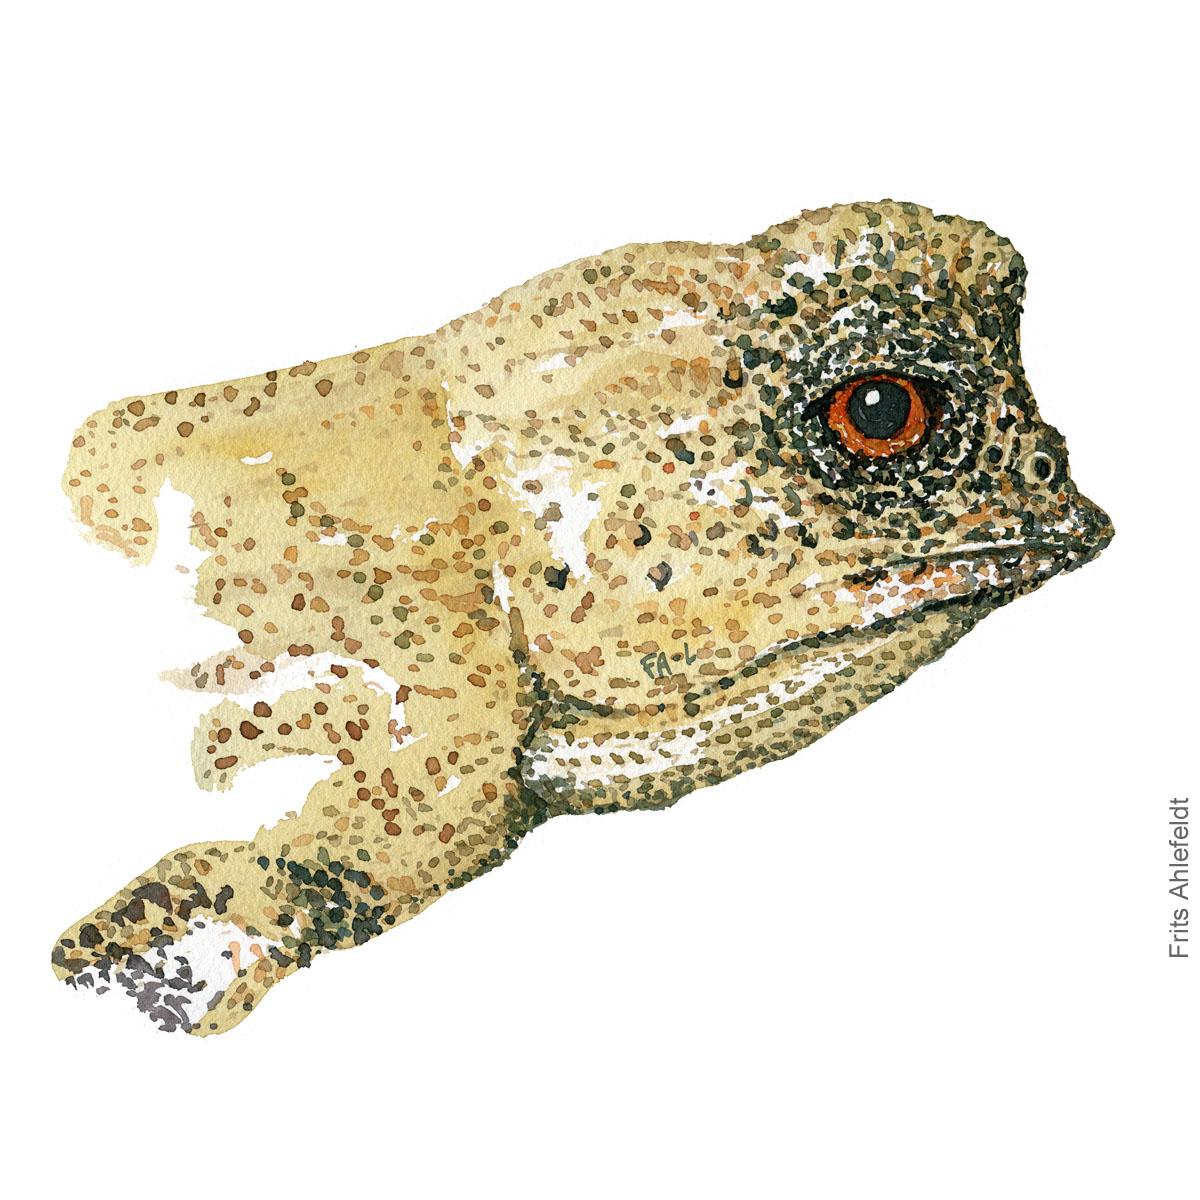 Dvaerg kamaeleon - Dwarf chameleon head. watercolor illustration. Painting by Frits Ahlefeldt - Fugle akvarel tegning